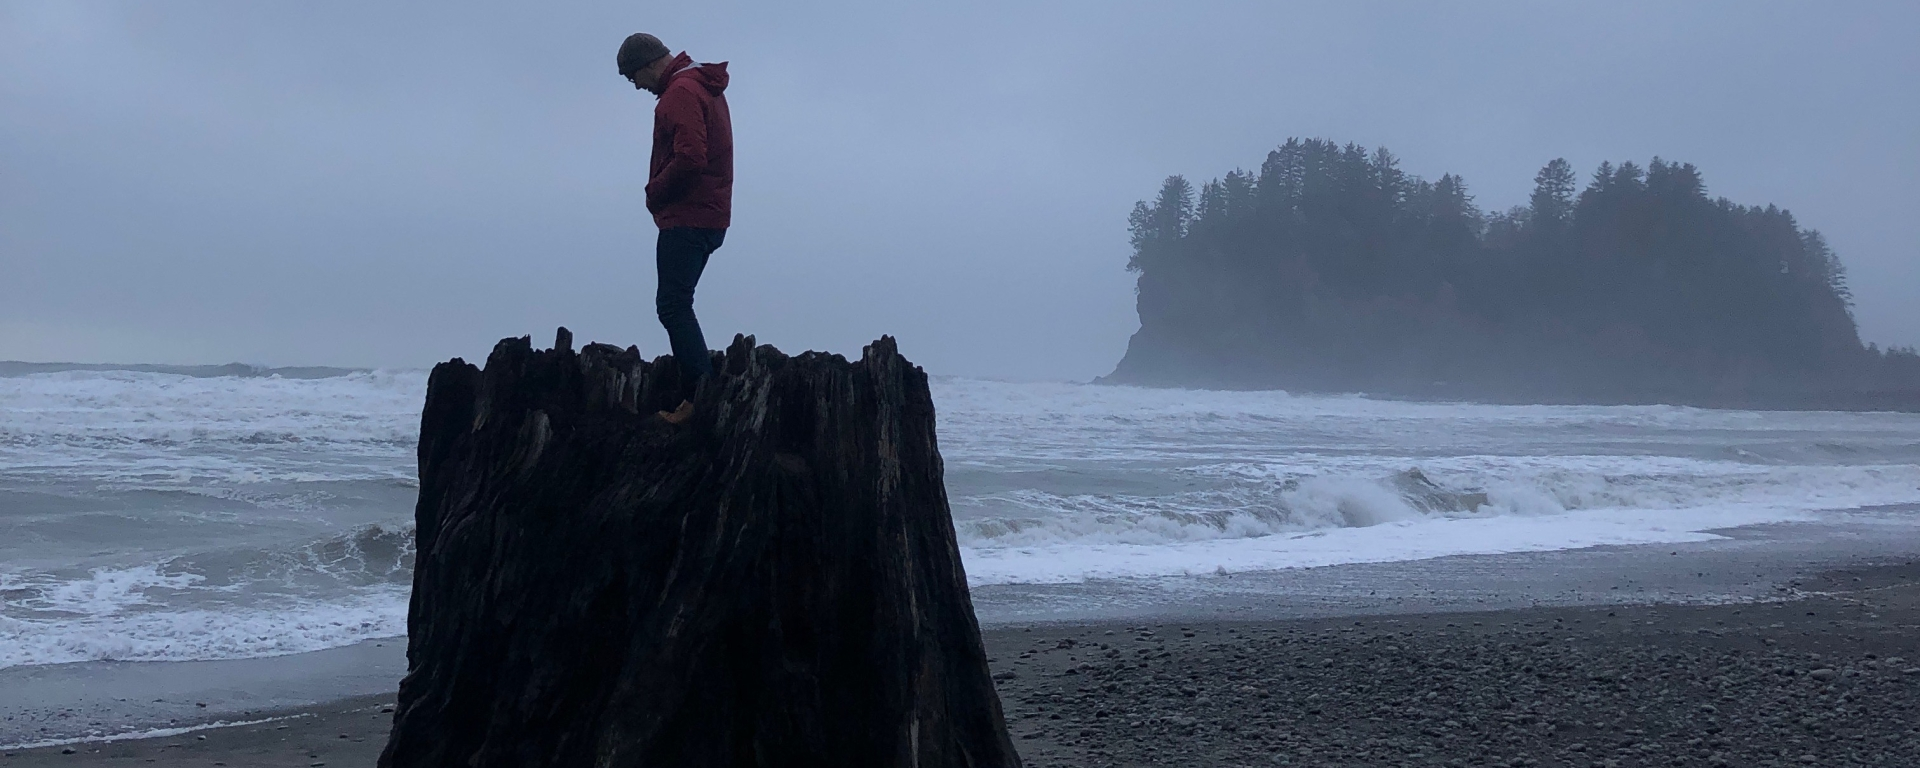 Artist Ray Monde standing on a giant stump at La Push, Washington